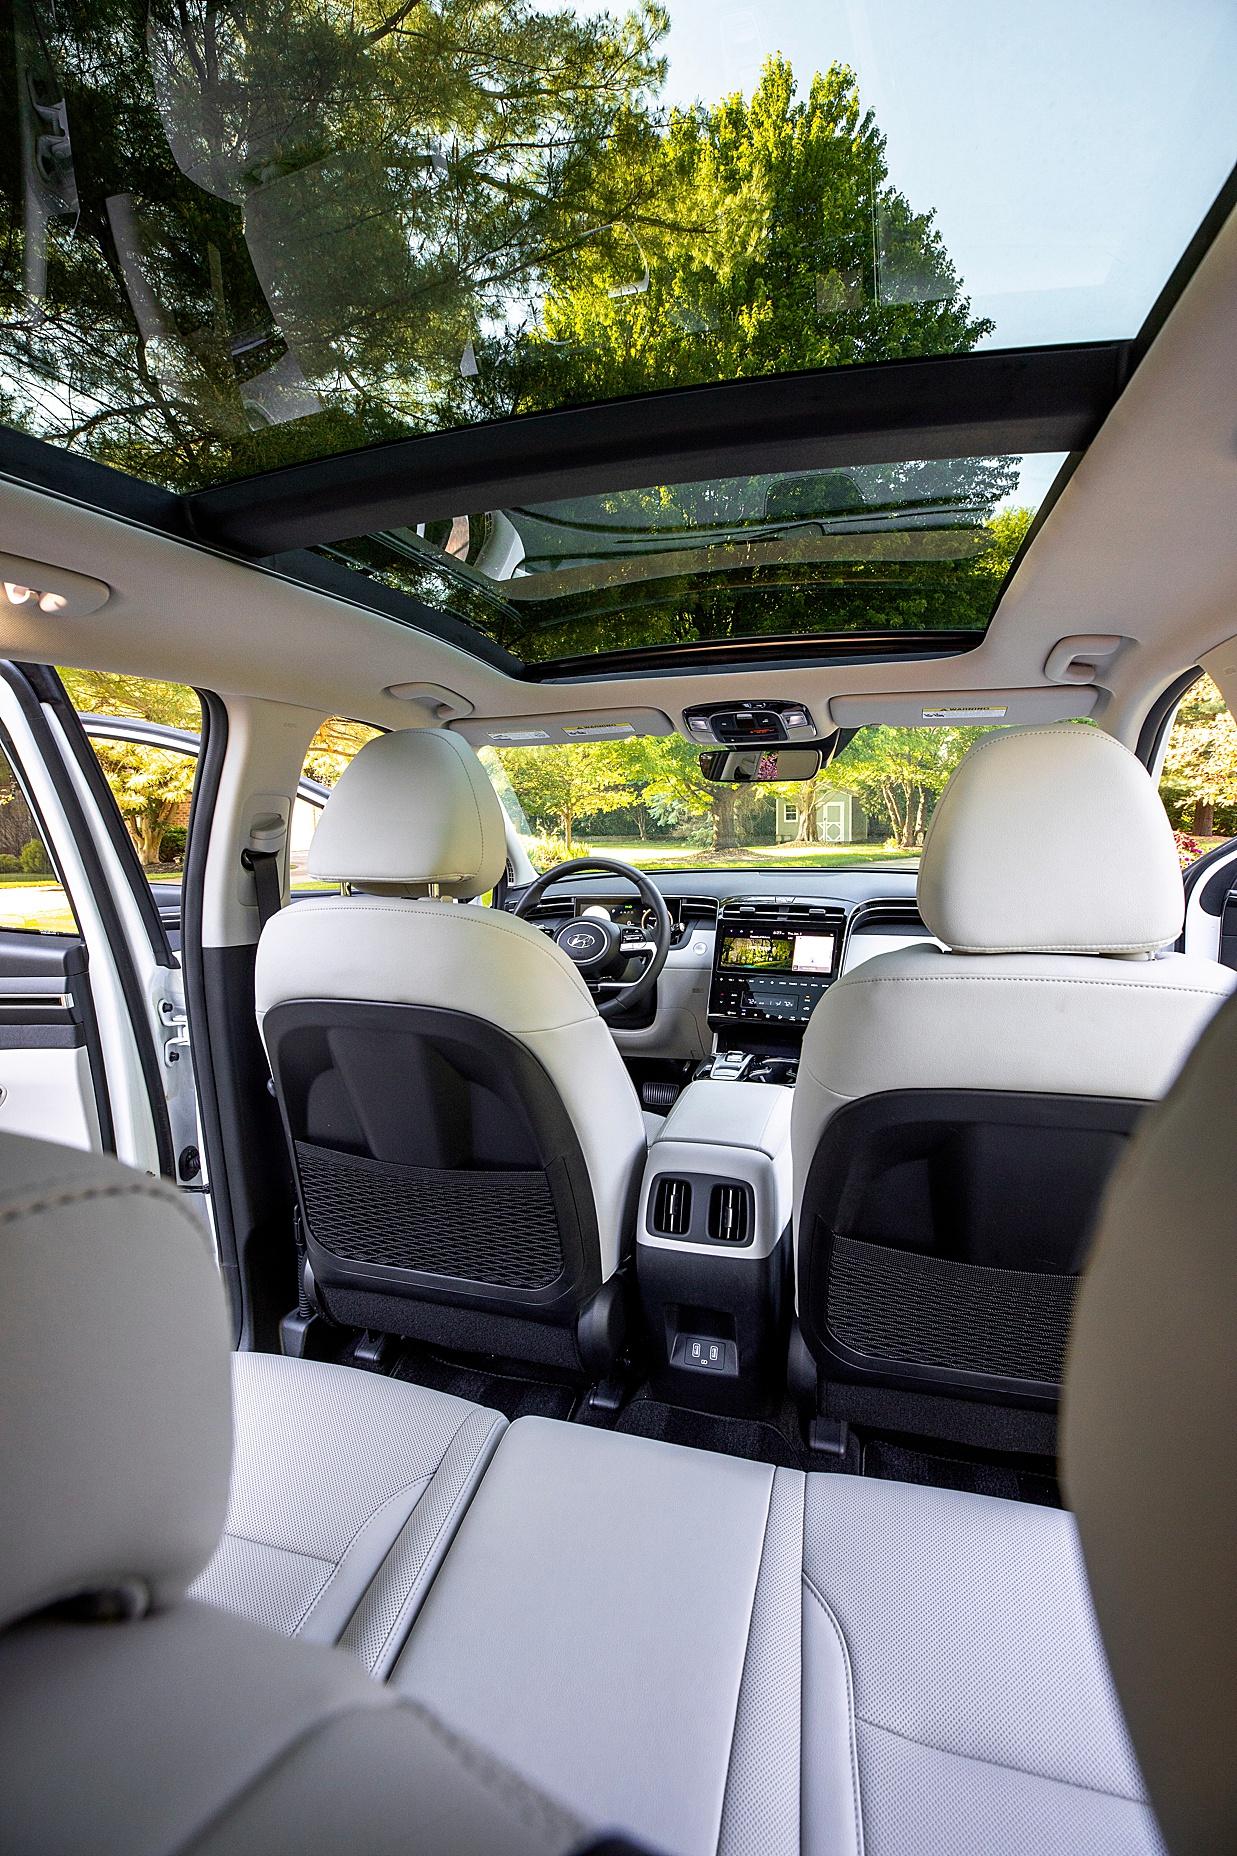 2022 hyundai tucson, hyundai tucson review, hyundai tucson, olivia rink car, small SUV, 2022 SUV